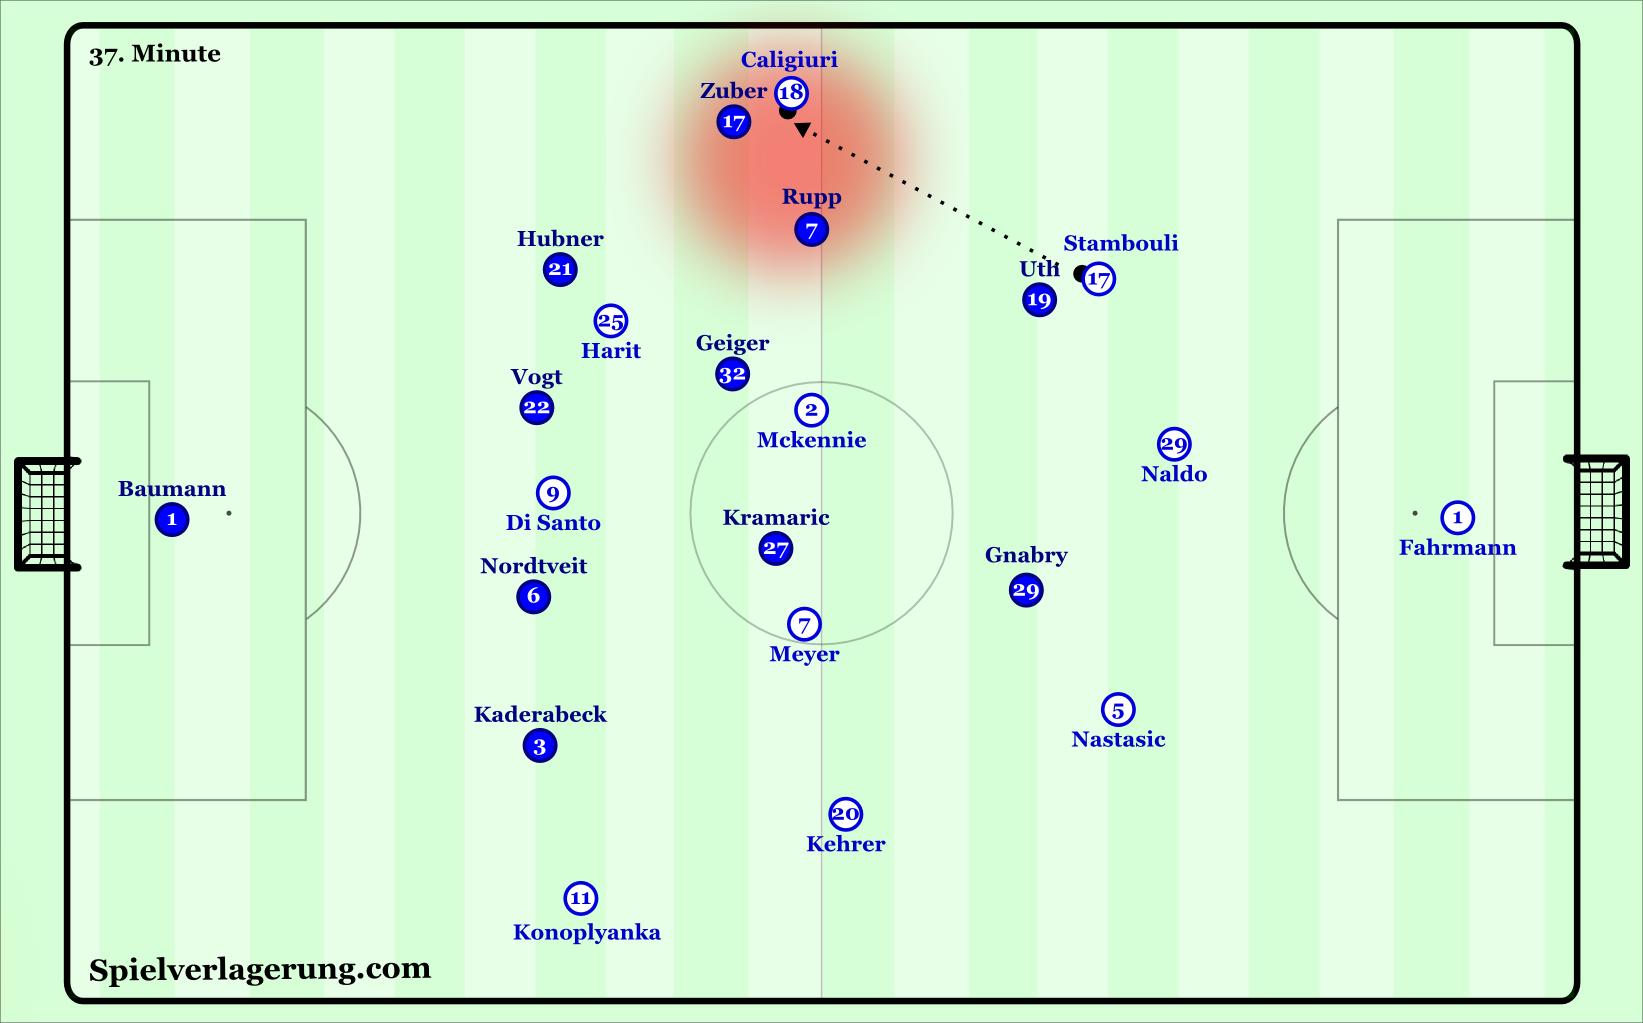 Schalke weak support